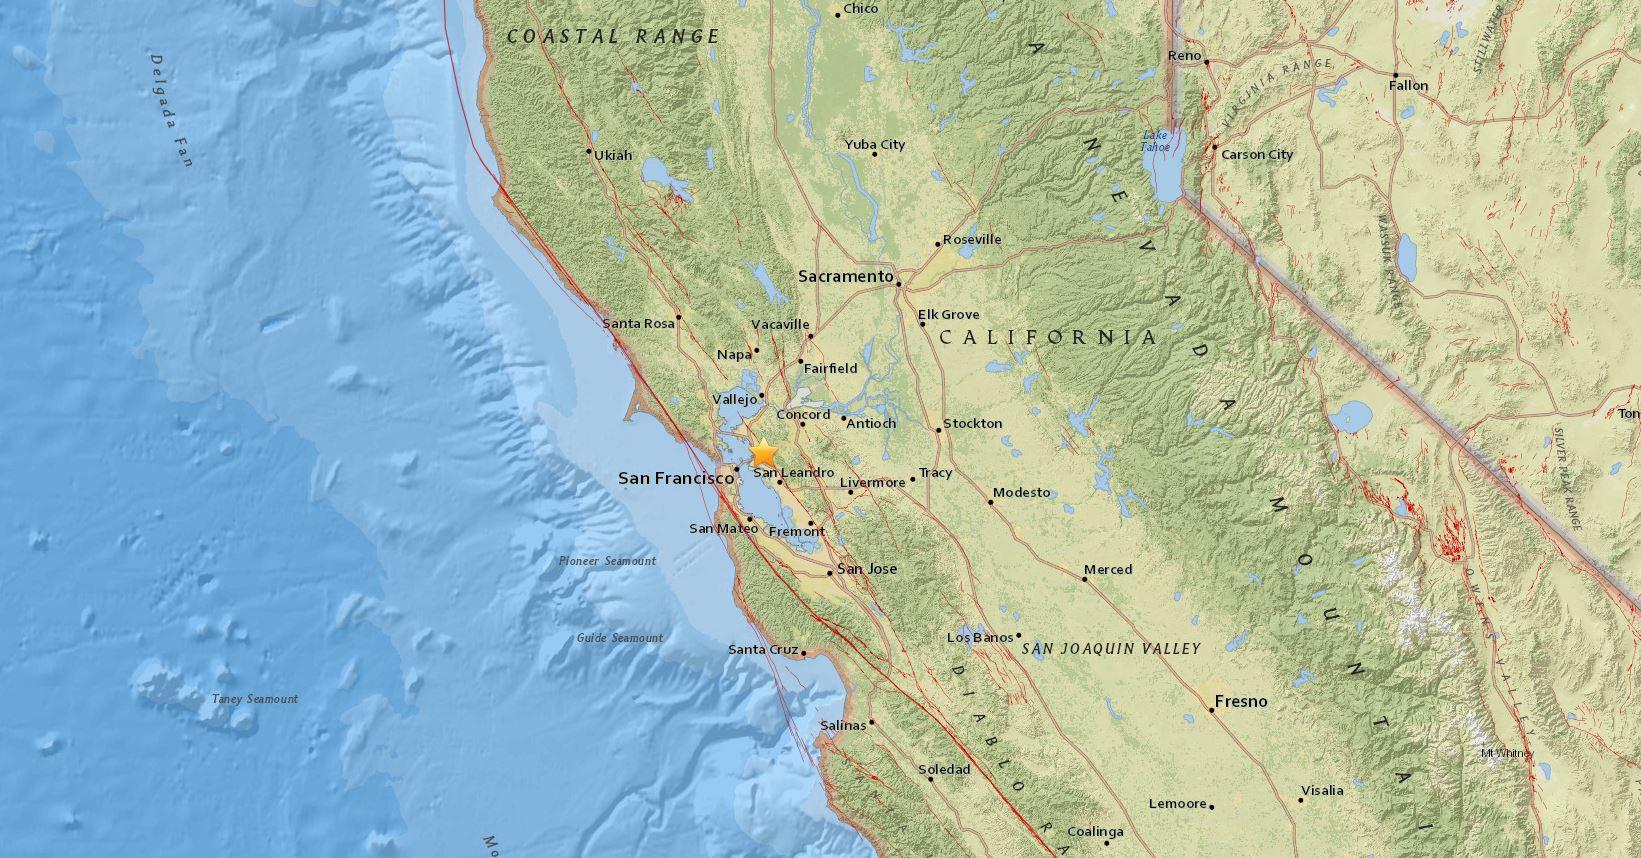 4.4 earth quake in San Francisco pic 2_361829